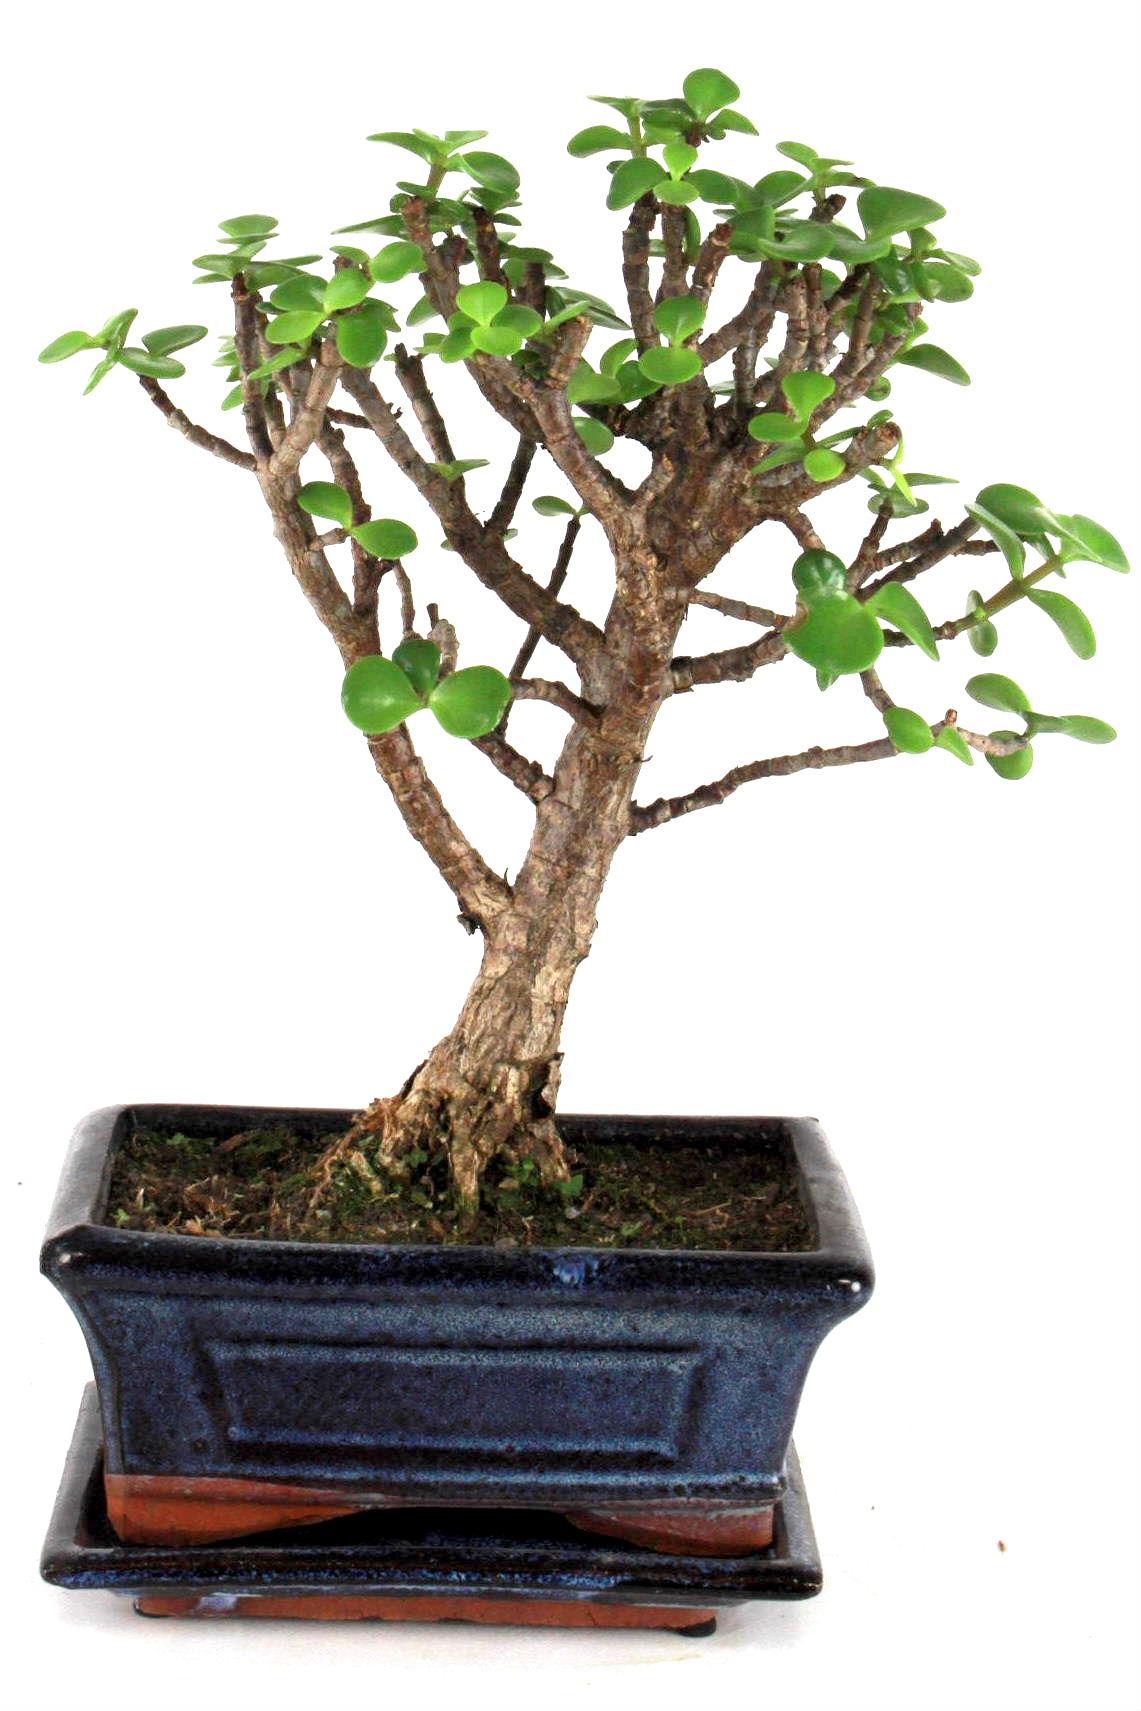 dickblatt 25 cm b164 bei oyaki bonsai kaufen. Black Bedroom Furniture Sets. Home Design Ideas